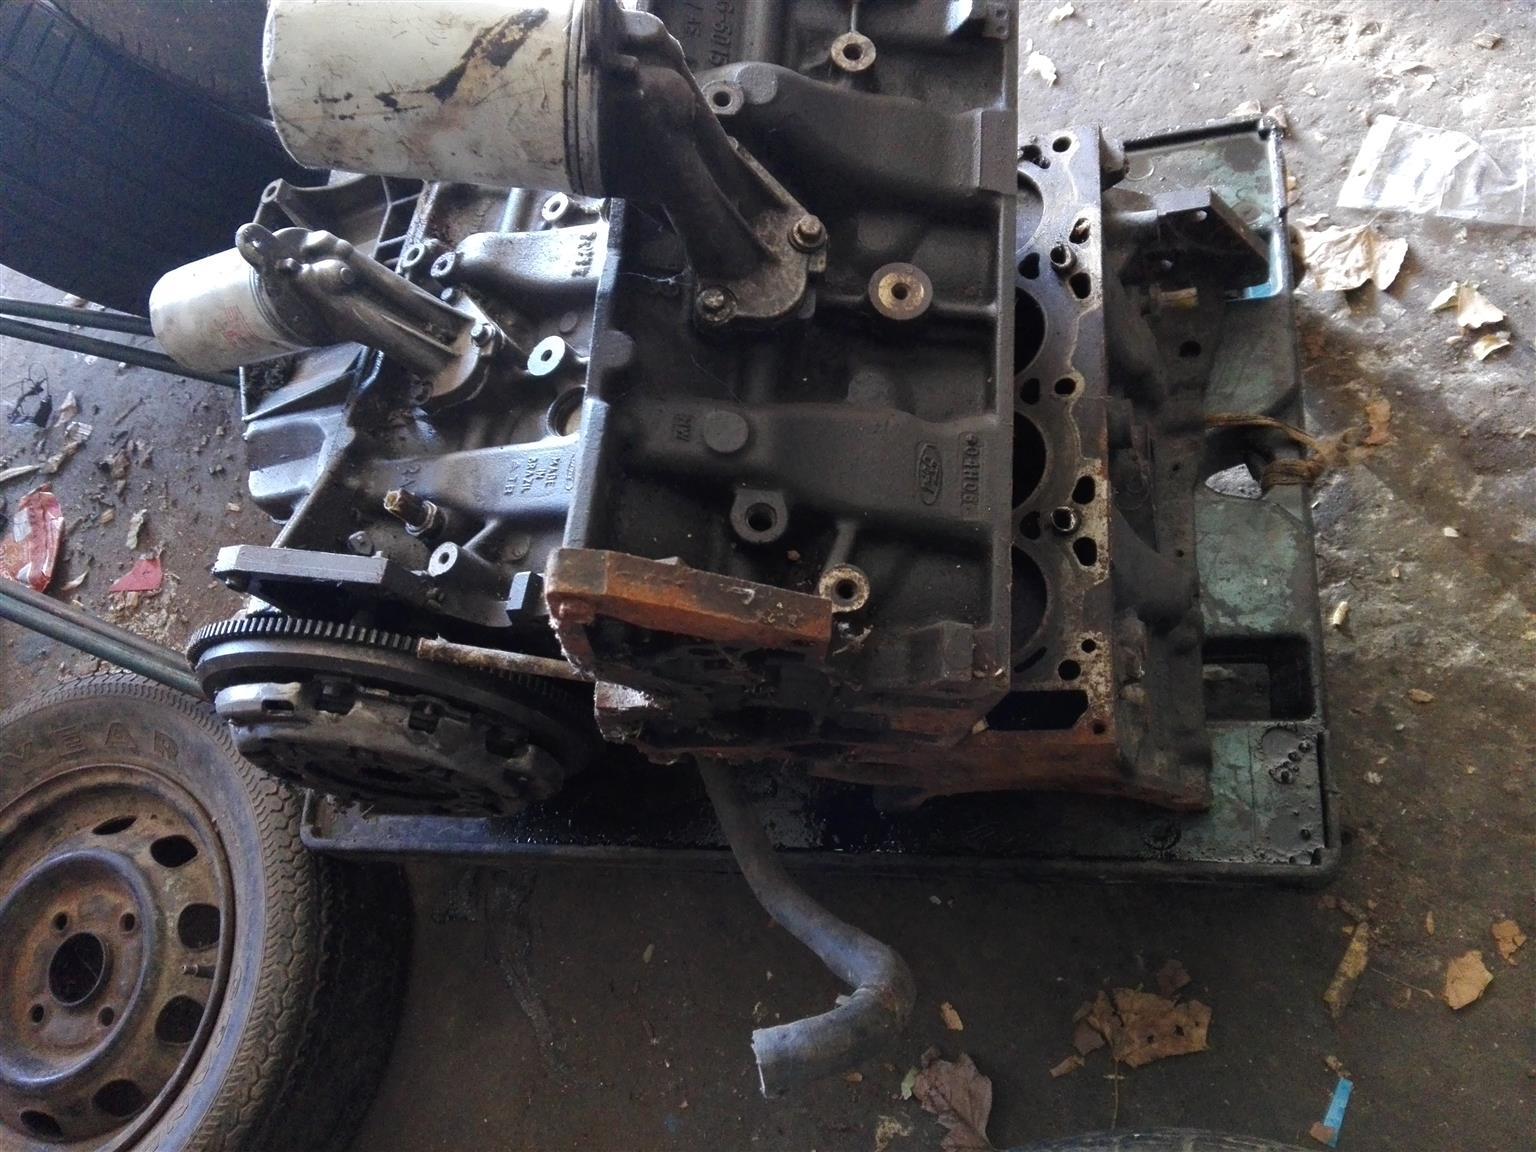 Ford bantam Rocam half engine 1.3 and 1.6 for sale